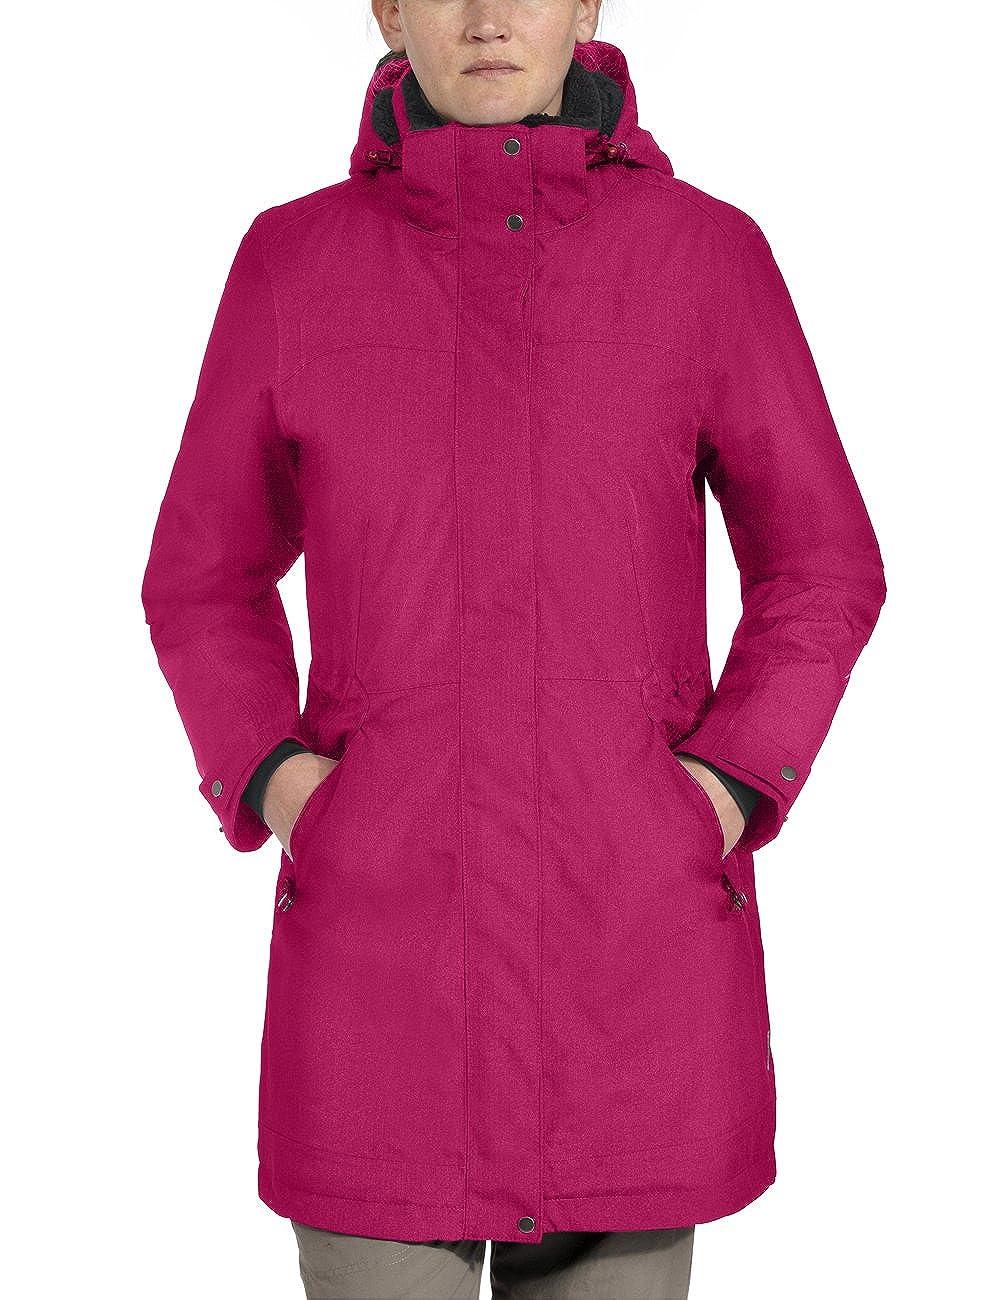 Purplecerise 12 maier sports Mtex Lisa Women's Coat